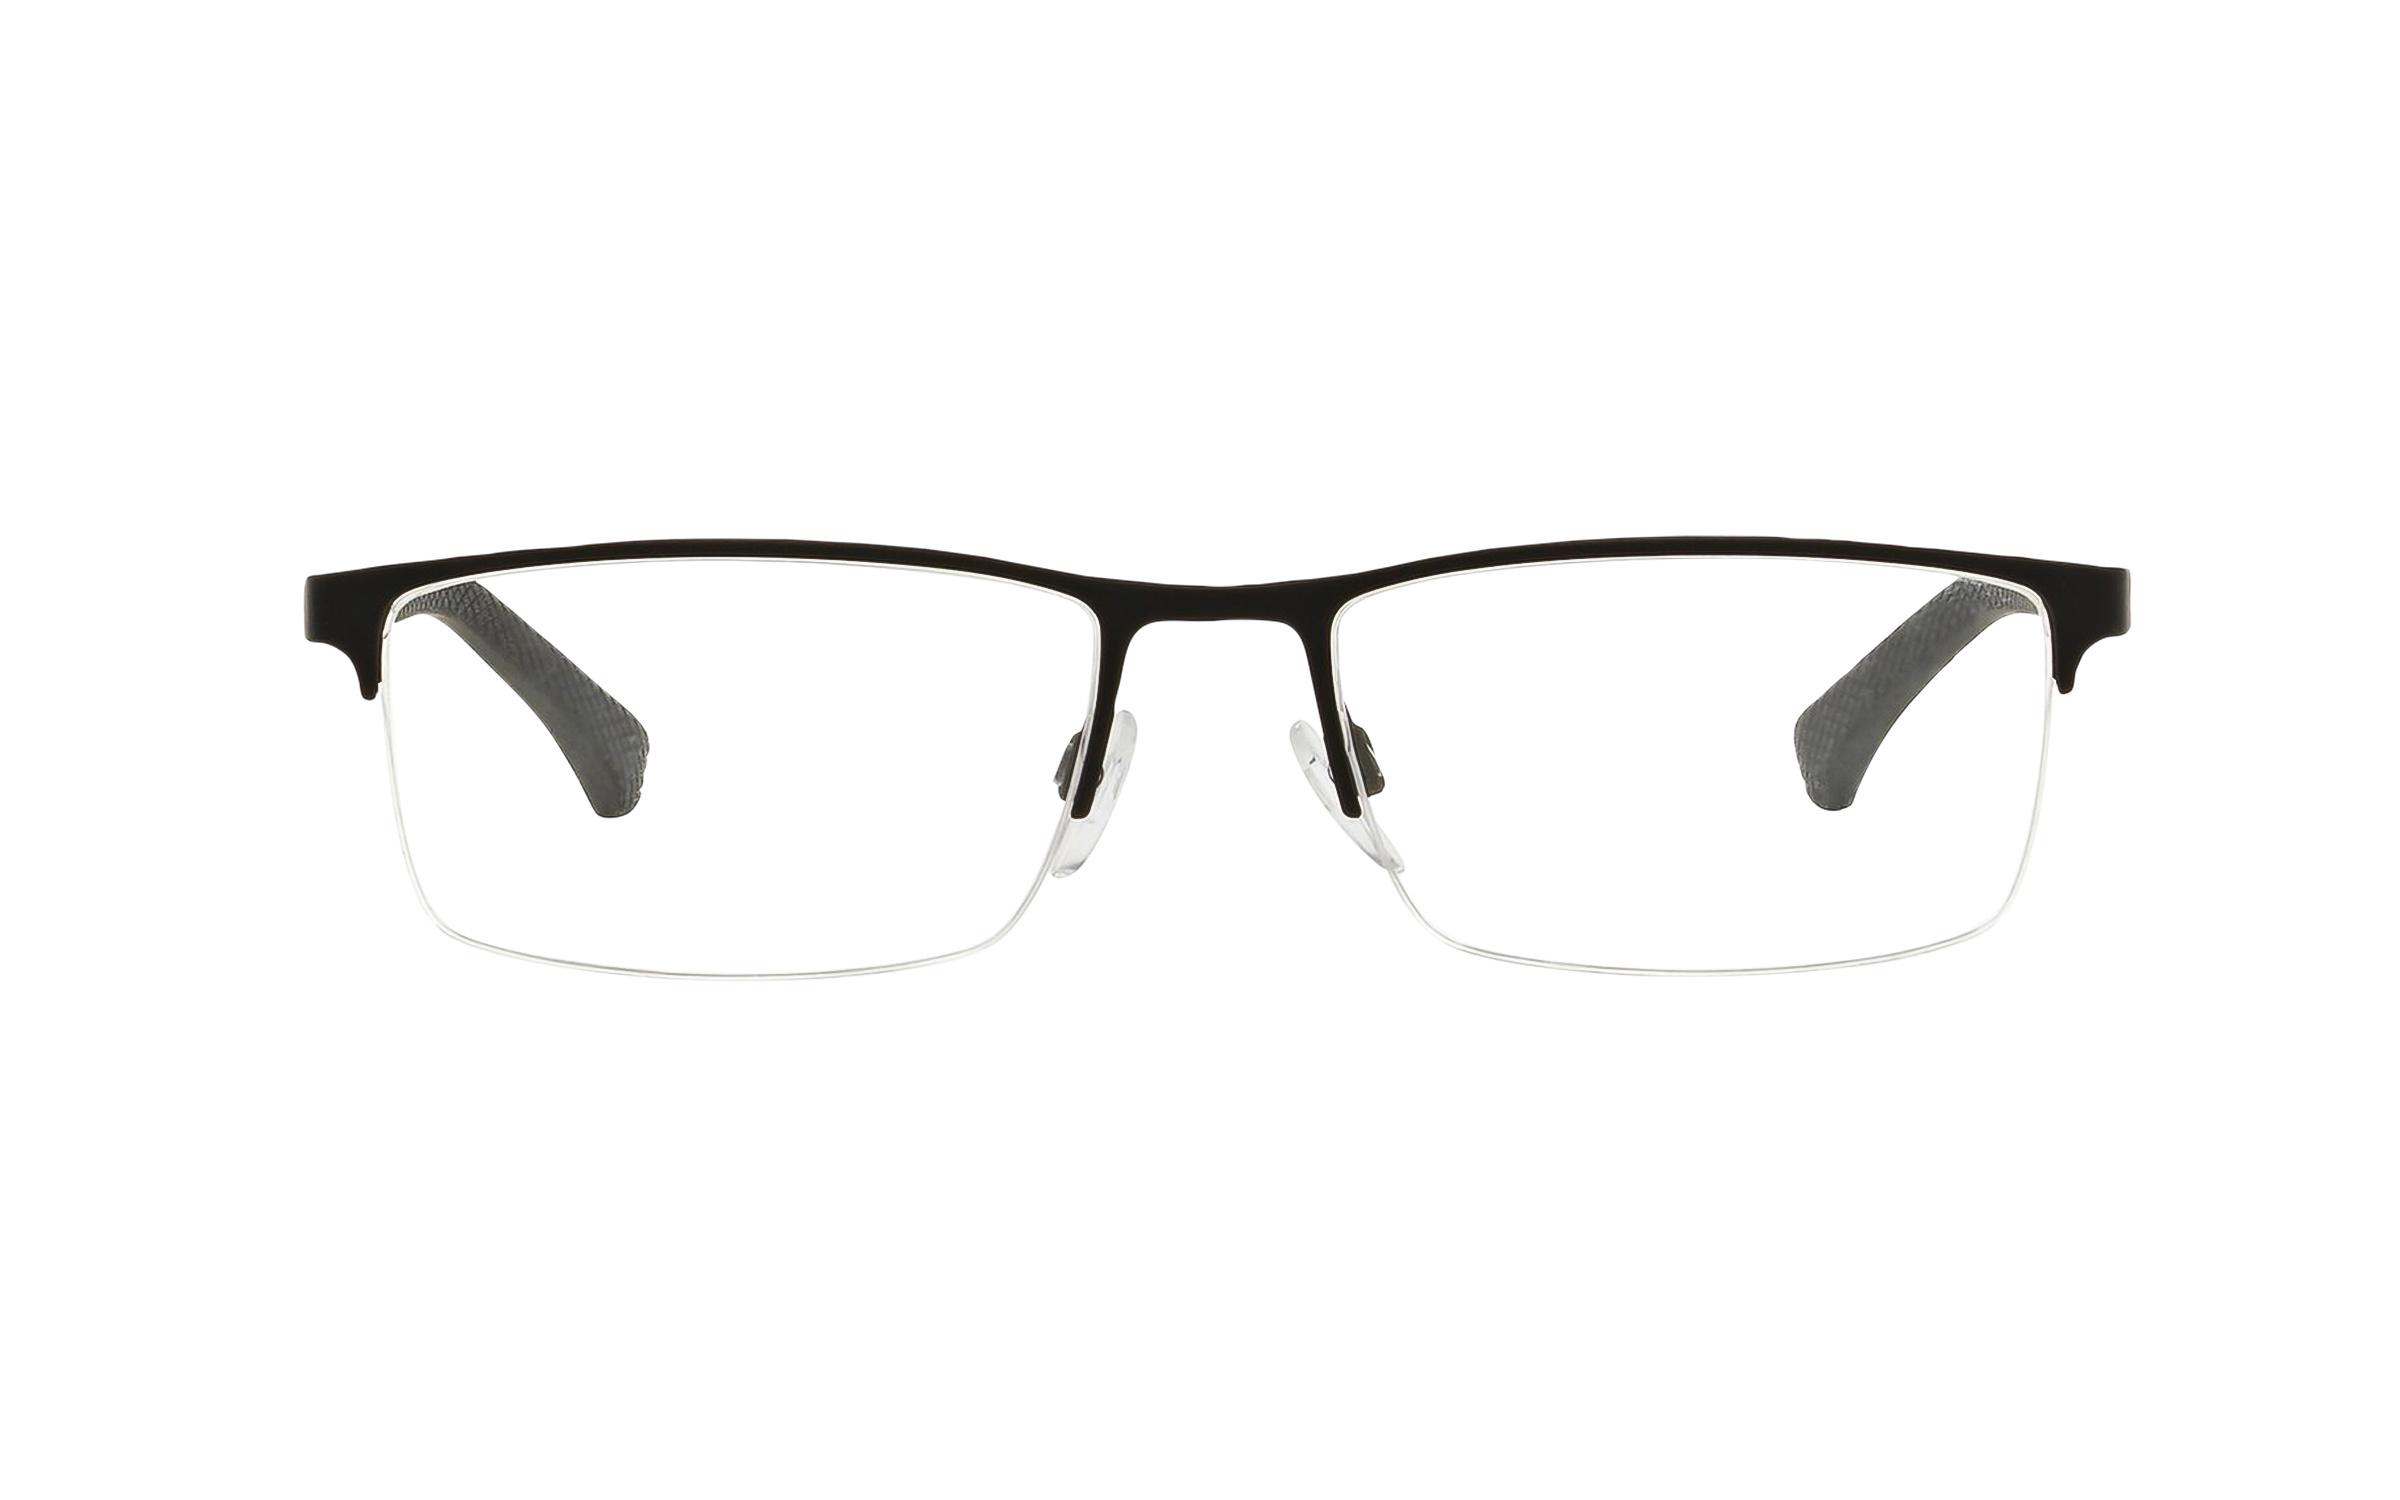 Luxottica Emporio Armani EA1041 3094 (53) Eyeglasses and Frame in Rubber Black | Plastic - Online Coastal